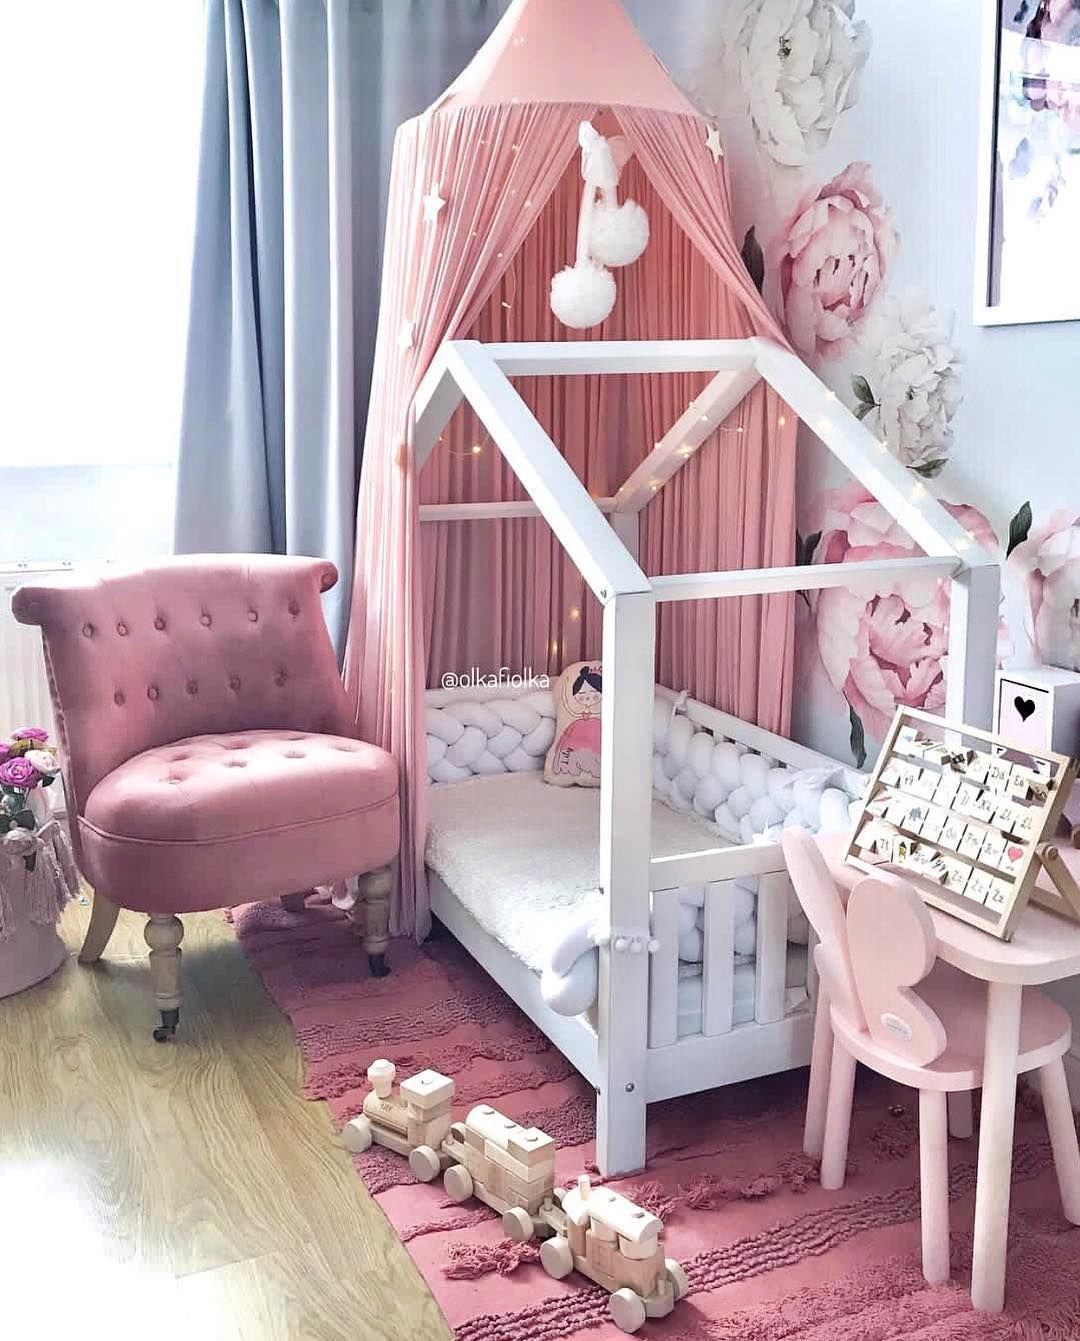 Teppich Kinderzimmer Fantasyroom Farbe Kinderzimmer Mädchen